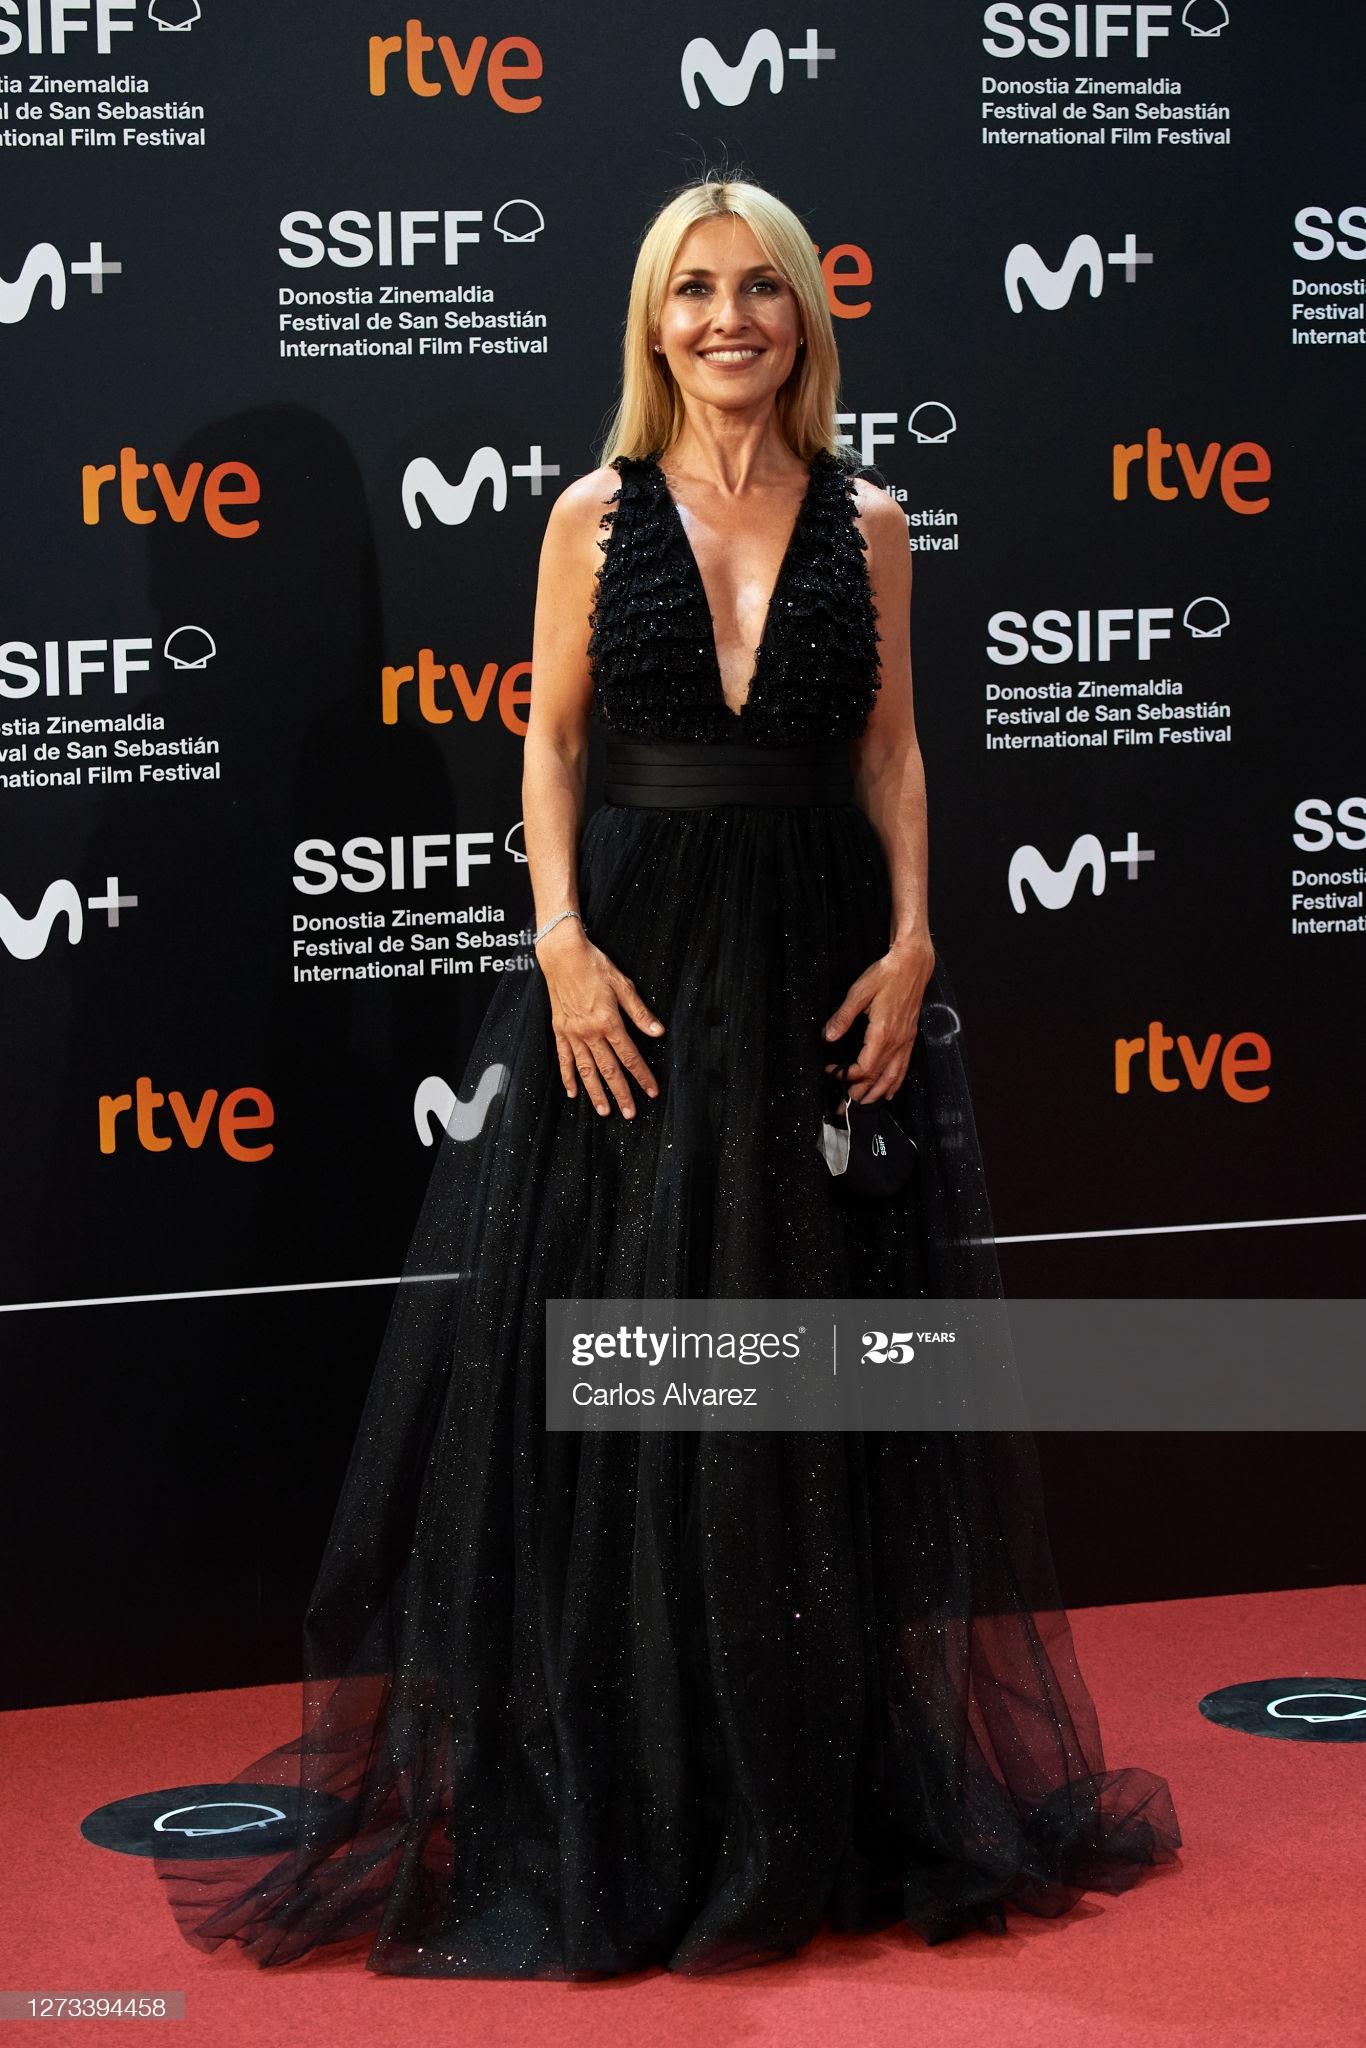 5e3d220d c731 4830 a86a 020b8ce23fcc - Festival de San Sebastián: Todas las celebrities que han lucido Jimmy Choo y Elisabetta Franchi en la alfombra roja